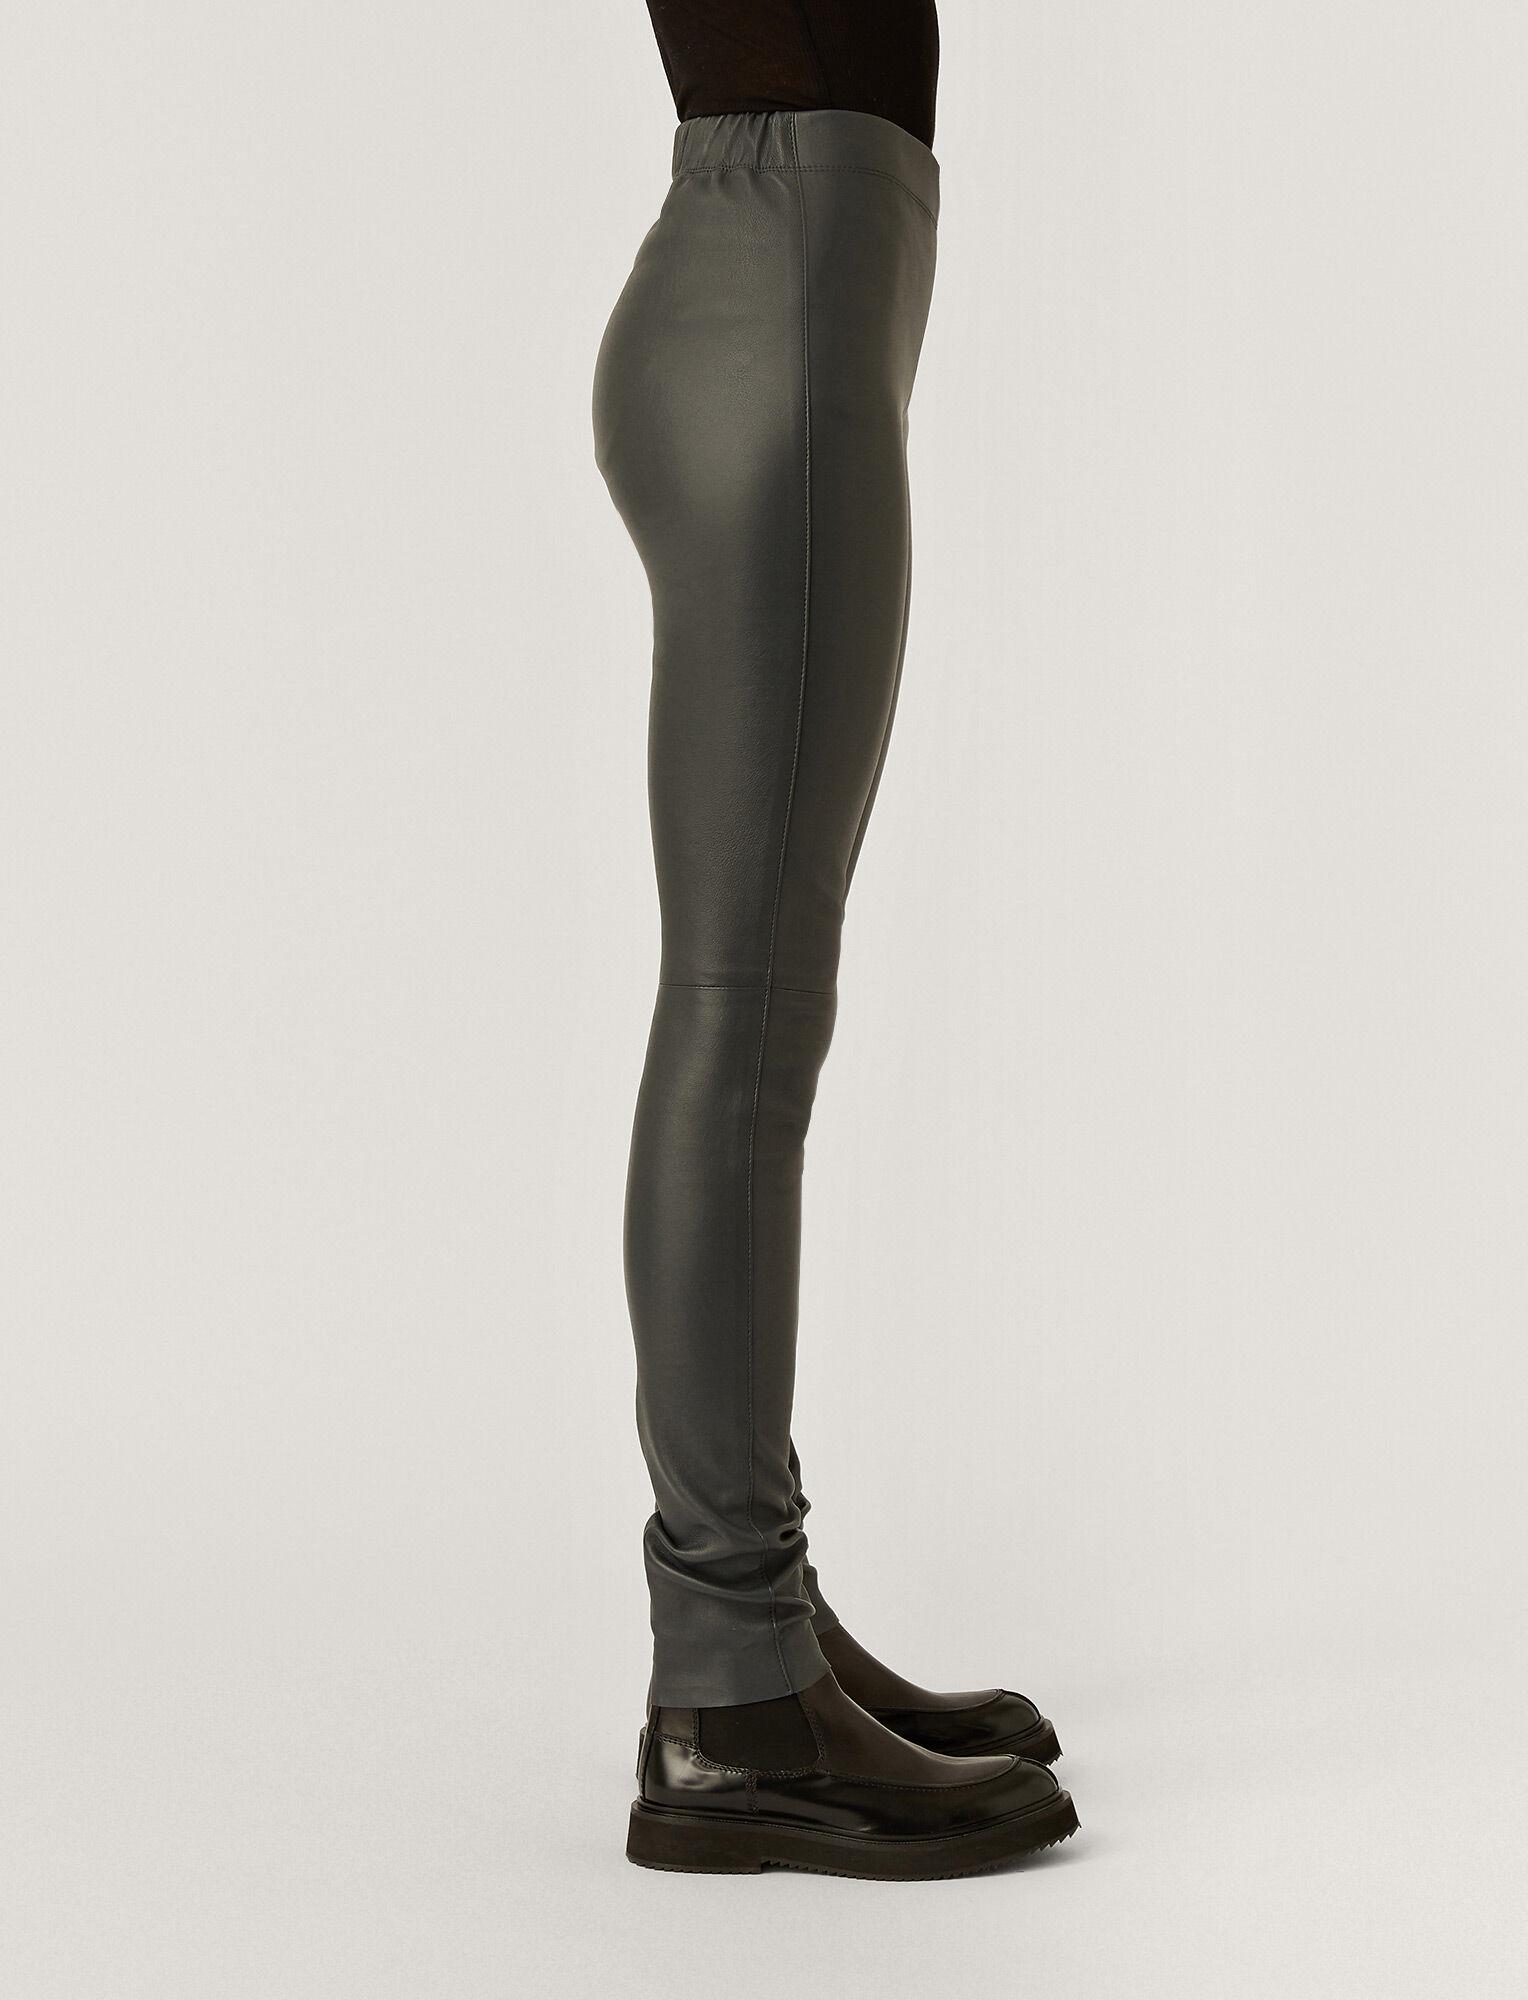 Joseph, Leather Stretch Leggings, in ANTHRACITE